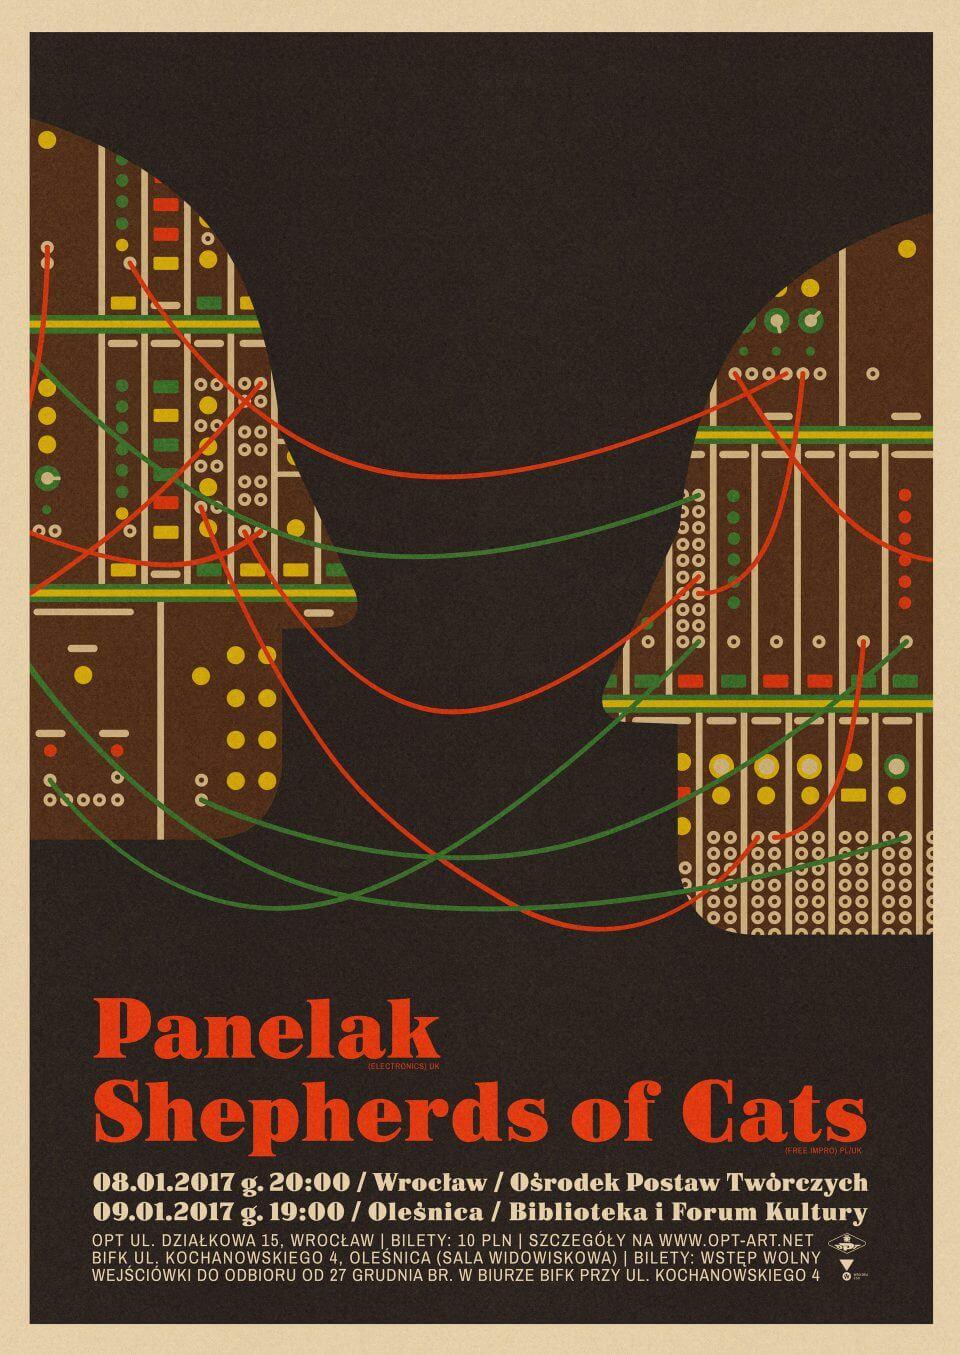 Shepherds of Cats & Panelak - plakat zapowiadający koncert